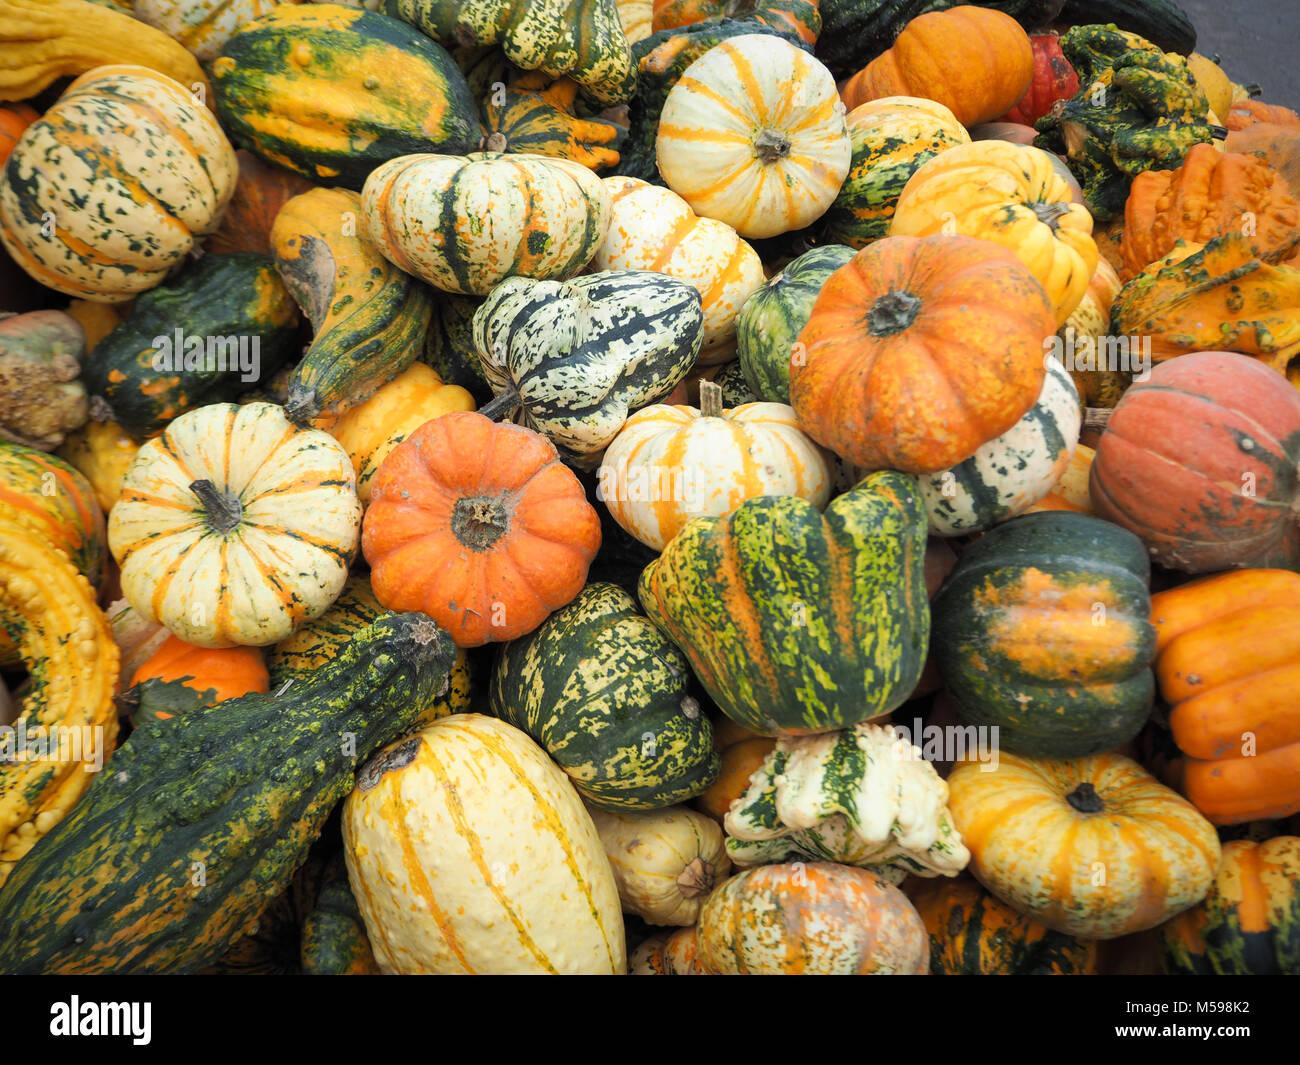 Pumpkins on a pumpkin farm. Autumn is here! - Stock Image